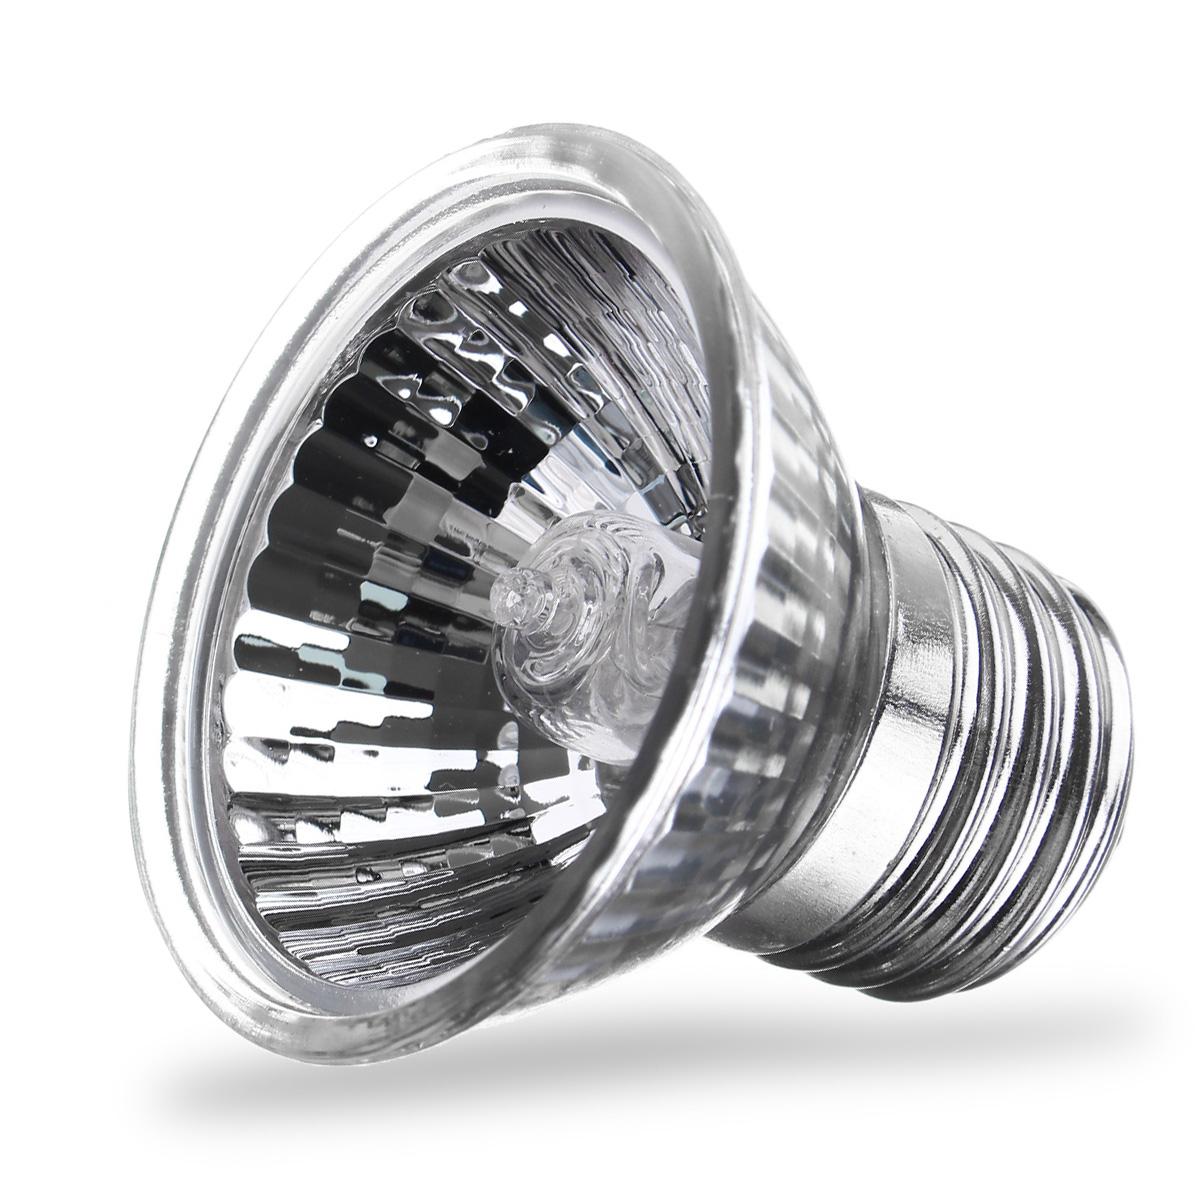 Plant Sun Bulb Reptile Heat Light Brooder Pet Heating Lamp E27 UVA+UVB